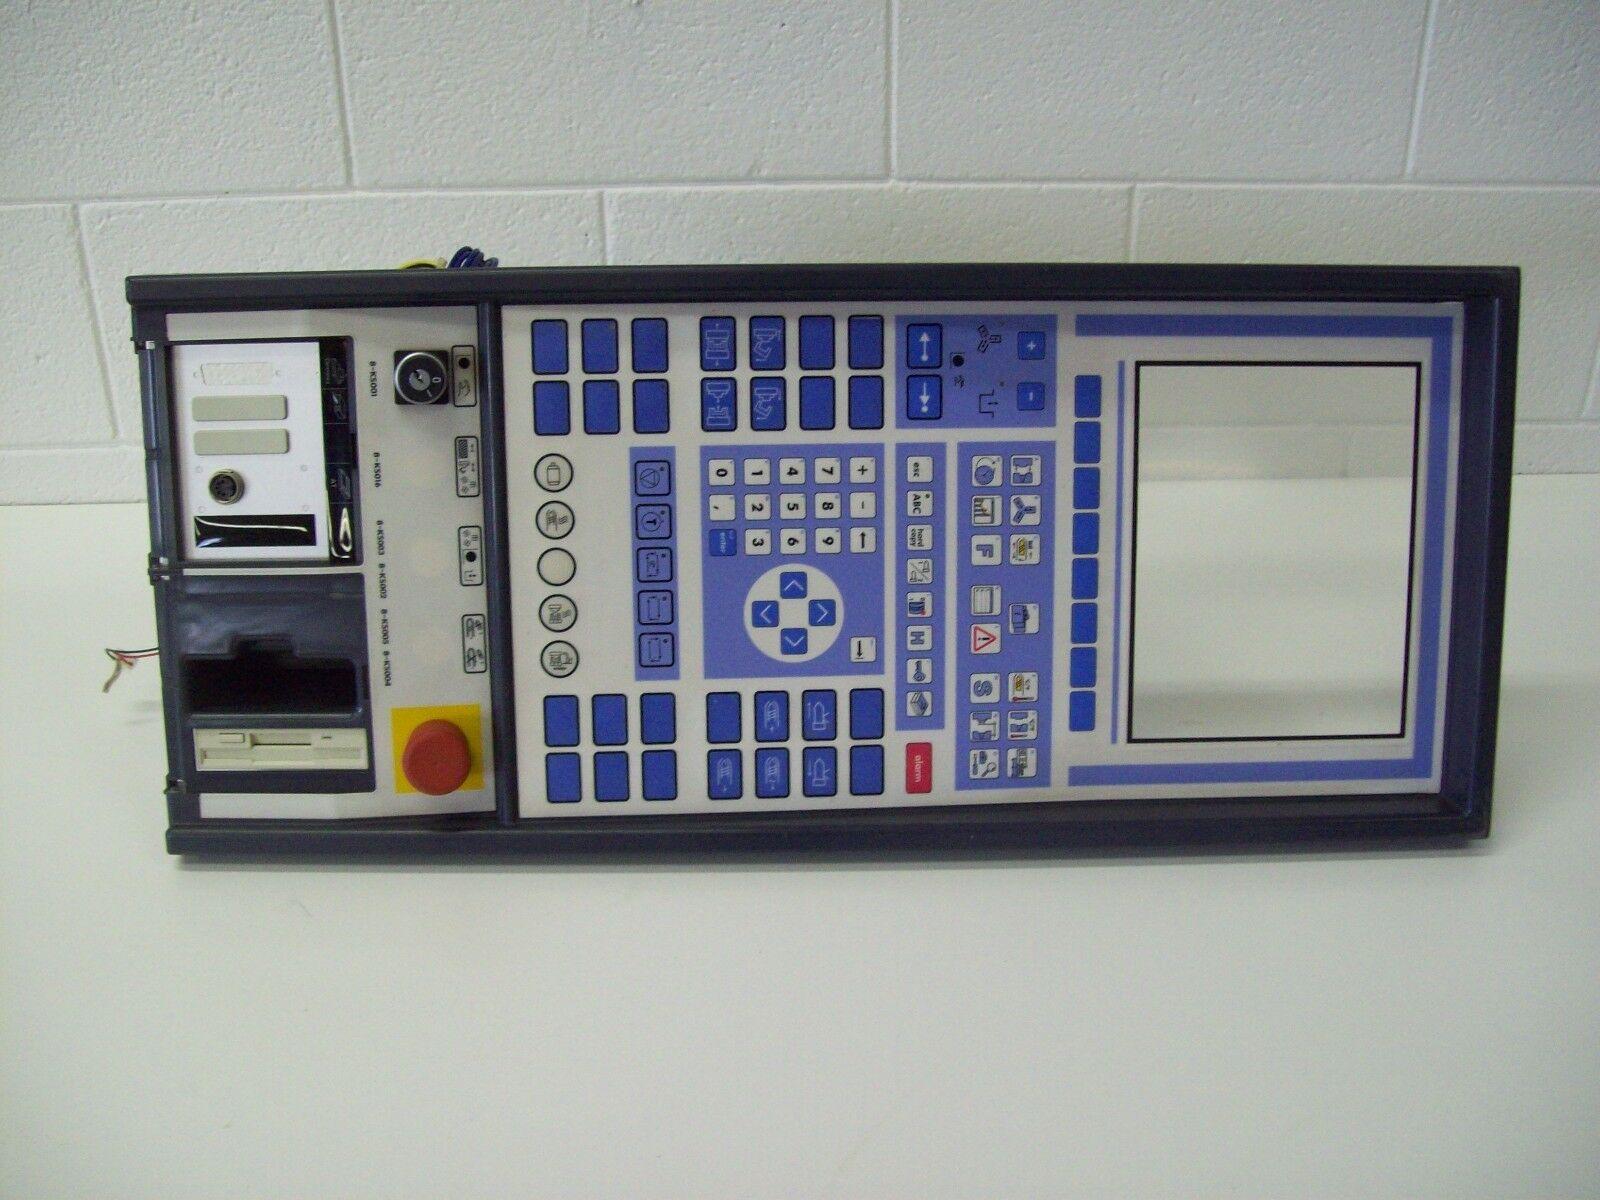 kraussmaffei注塑机全电动伺服驱动器维修.jpg